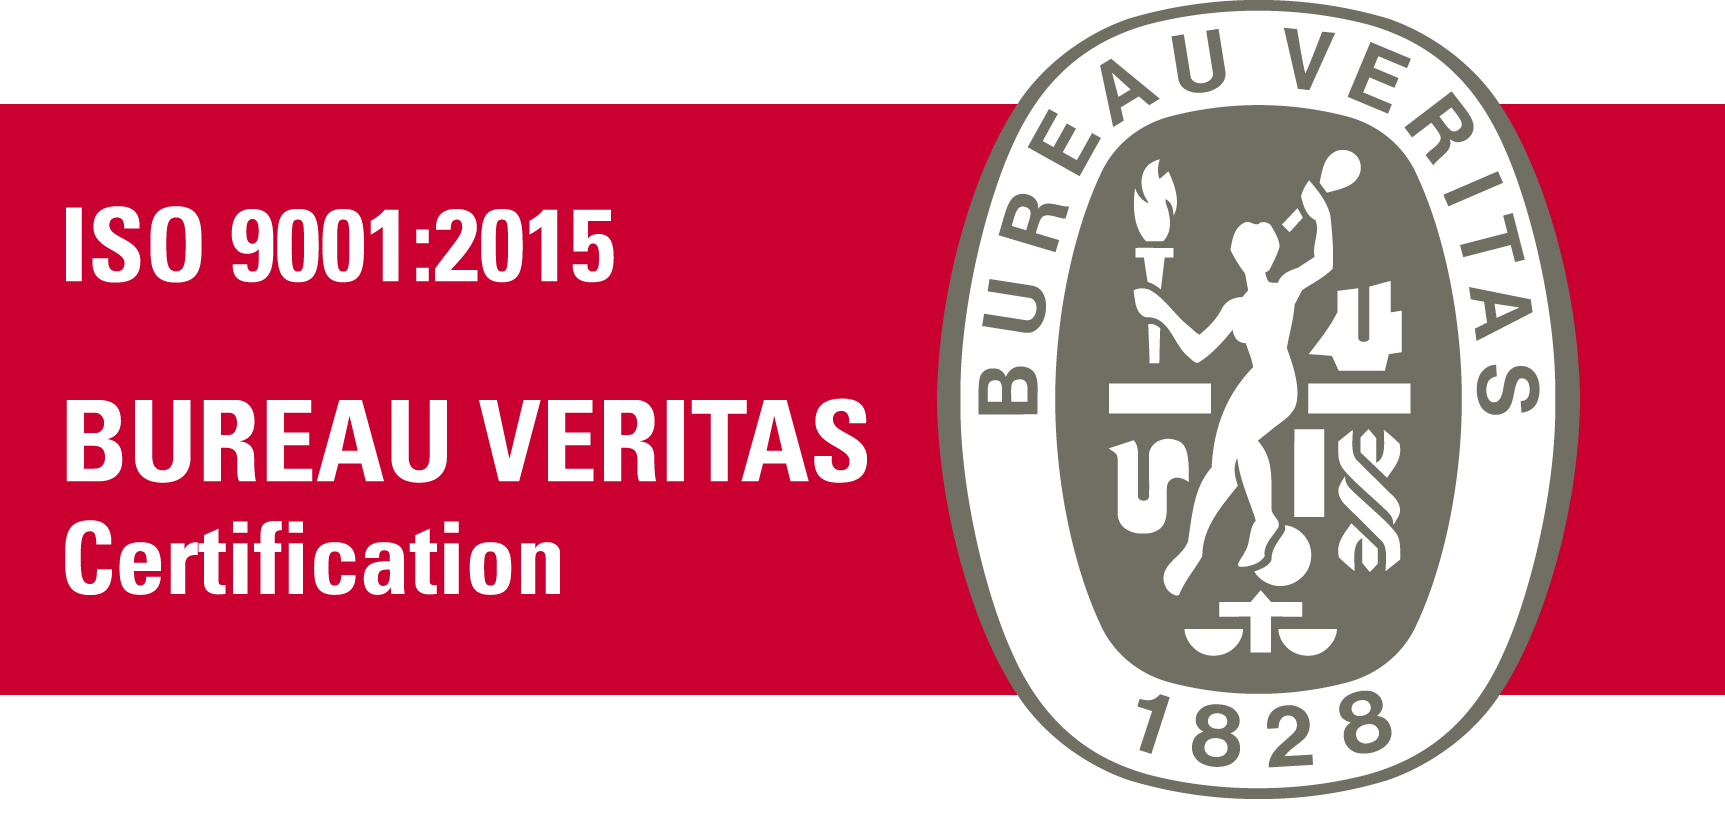 Bureau Veritas - Certification ISO 9001:2015